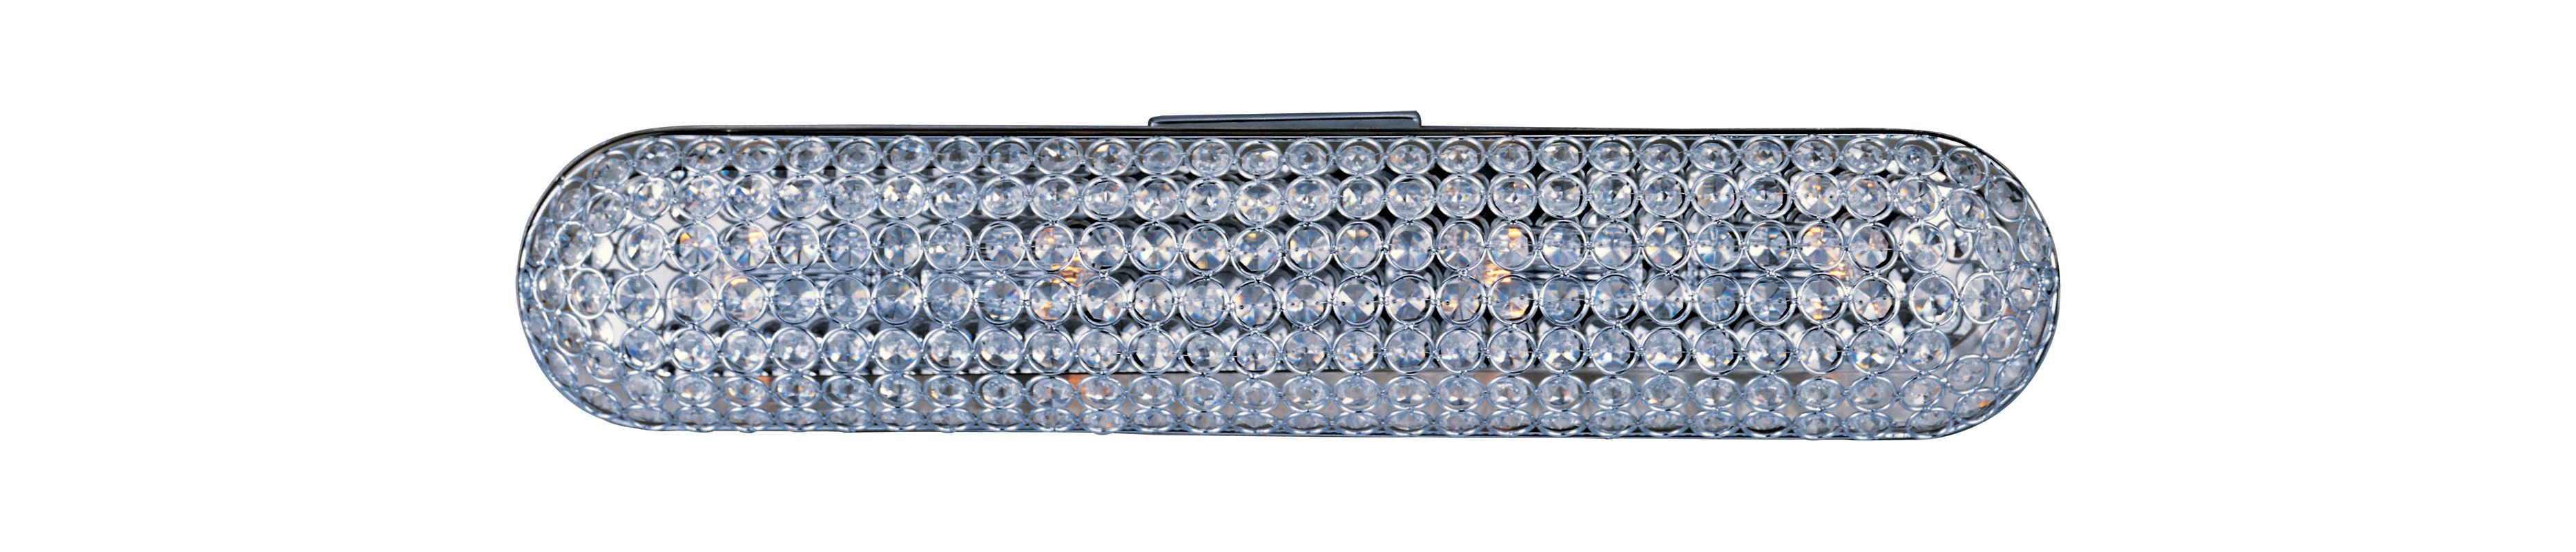 ET2 E24041-20PC Polished Chrome Contemporary Brilliant Bathroom Light Sale $158.00 ITEM: bci1908399 ID#:E24041-20PC UPC: 845094049555 :